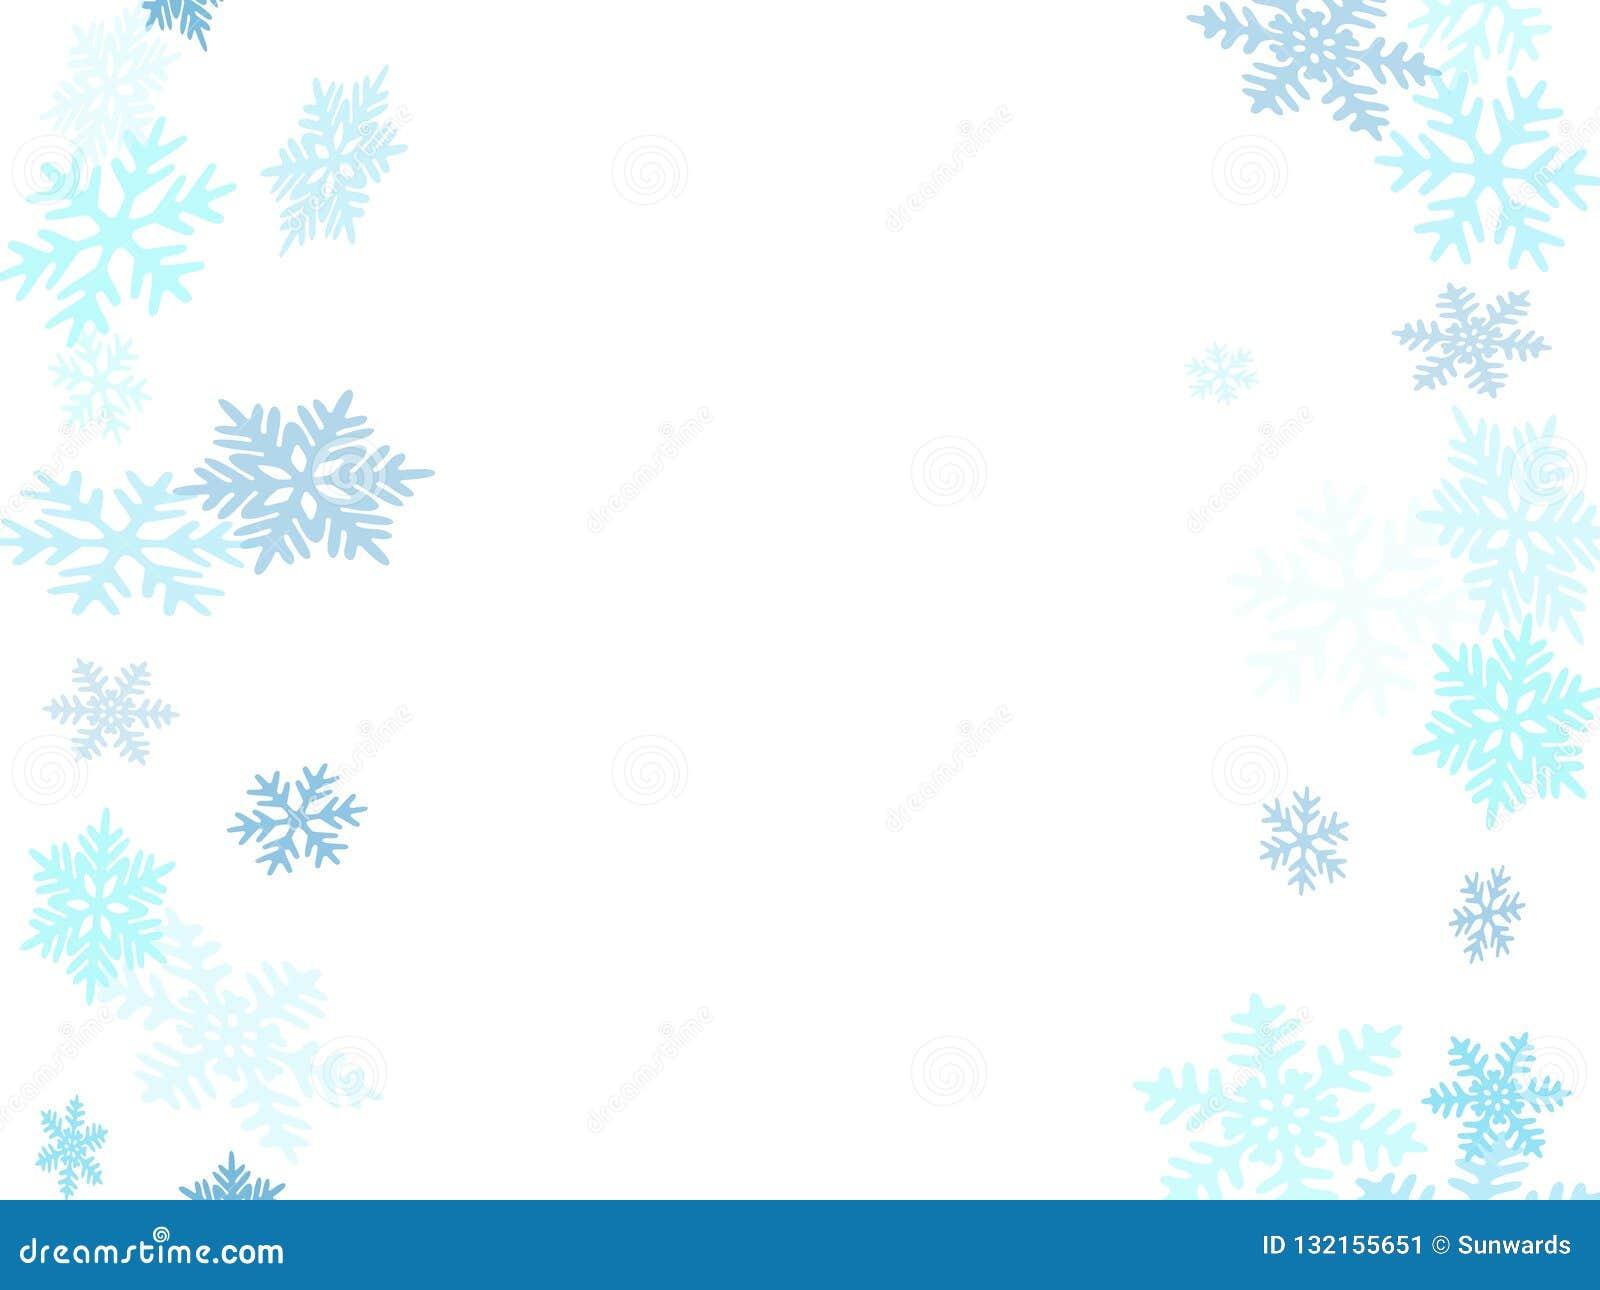 winter snowflakes border card vector background stock